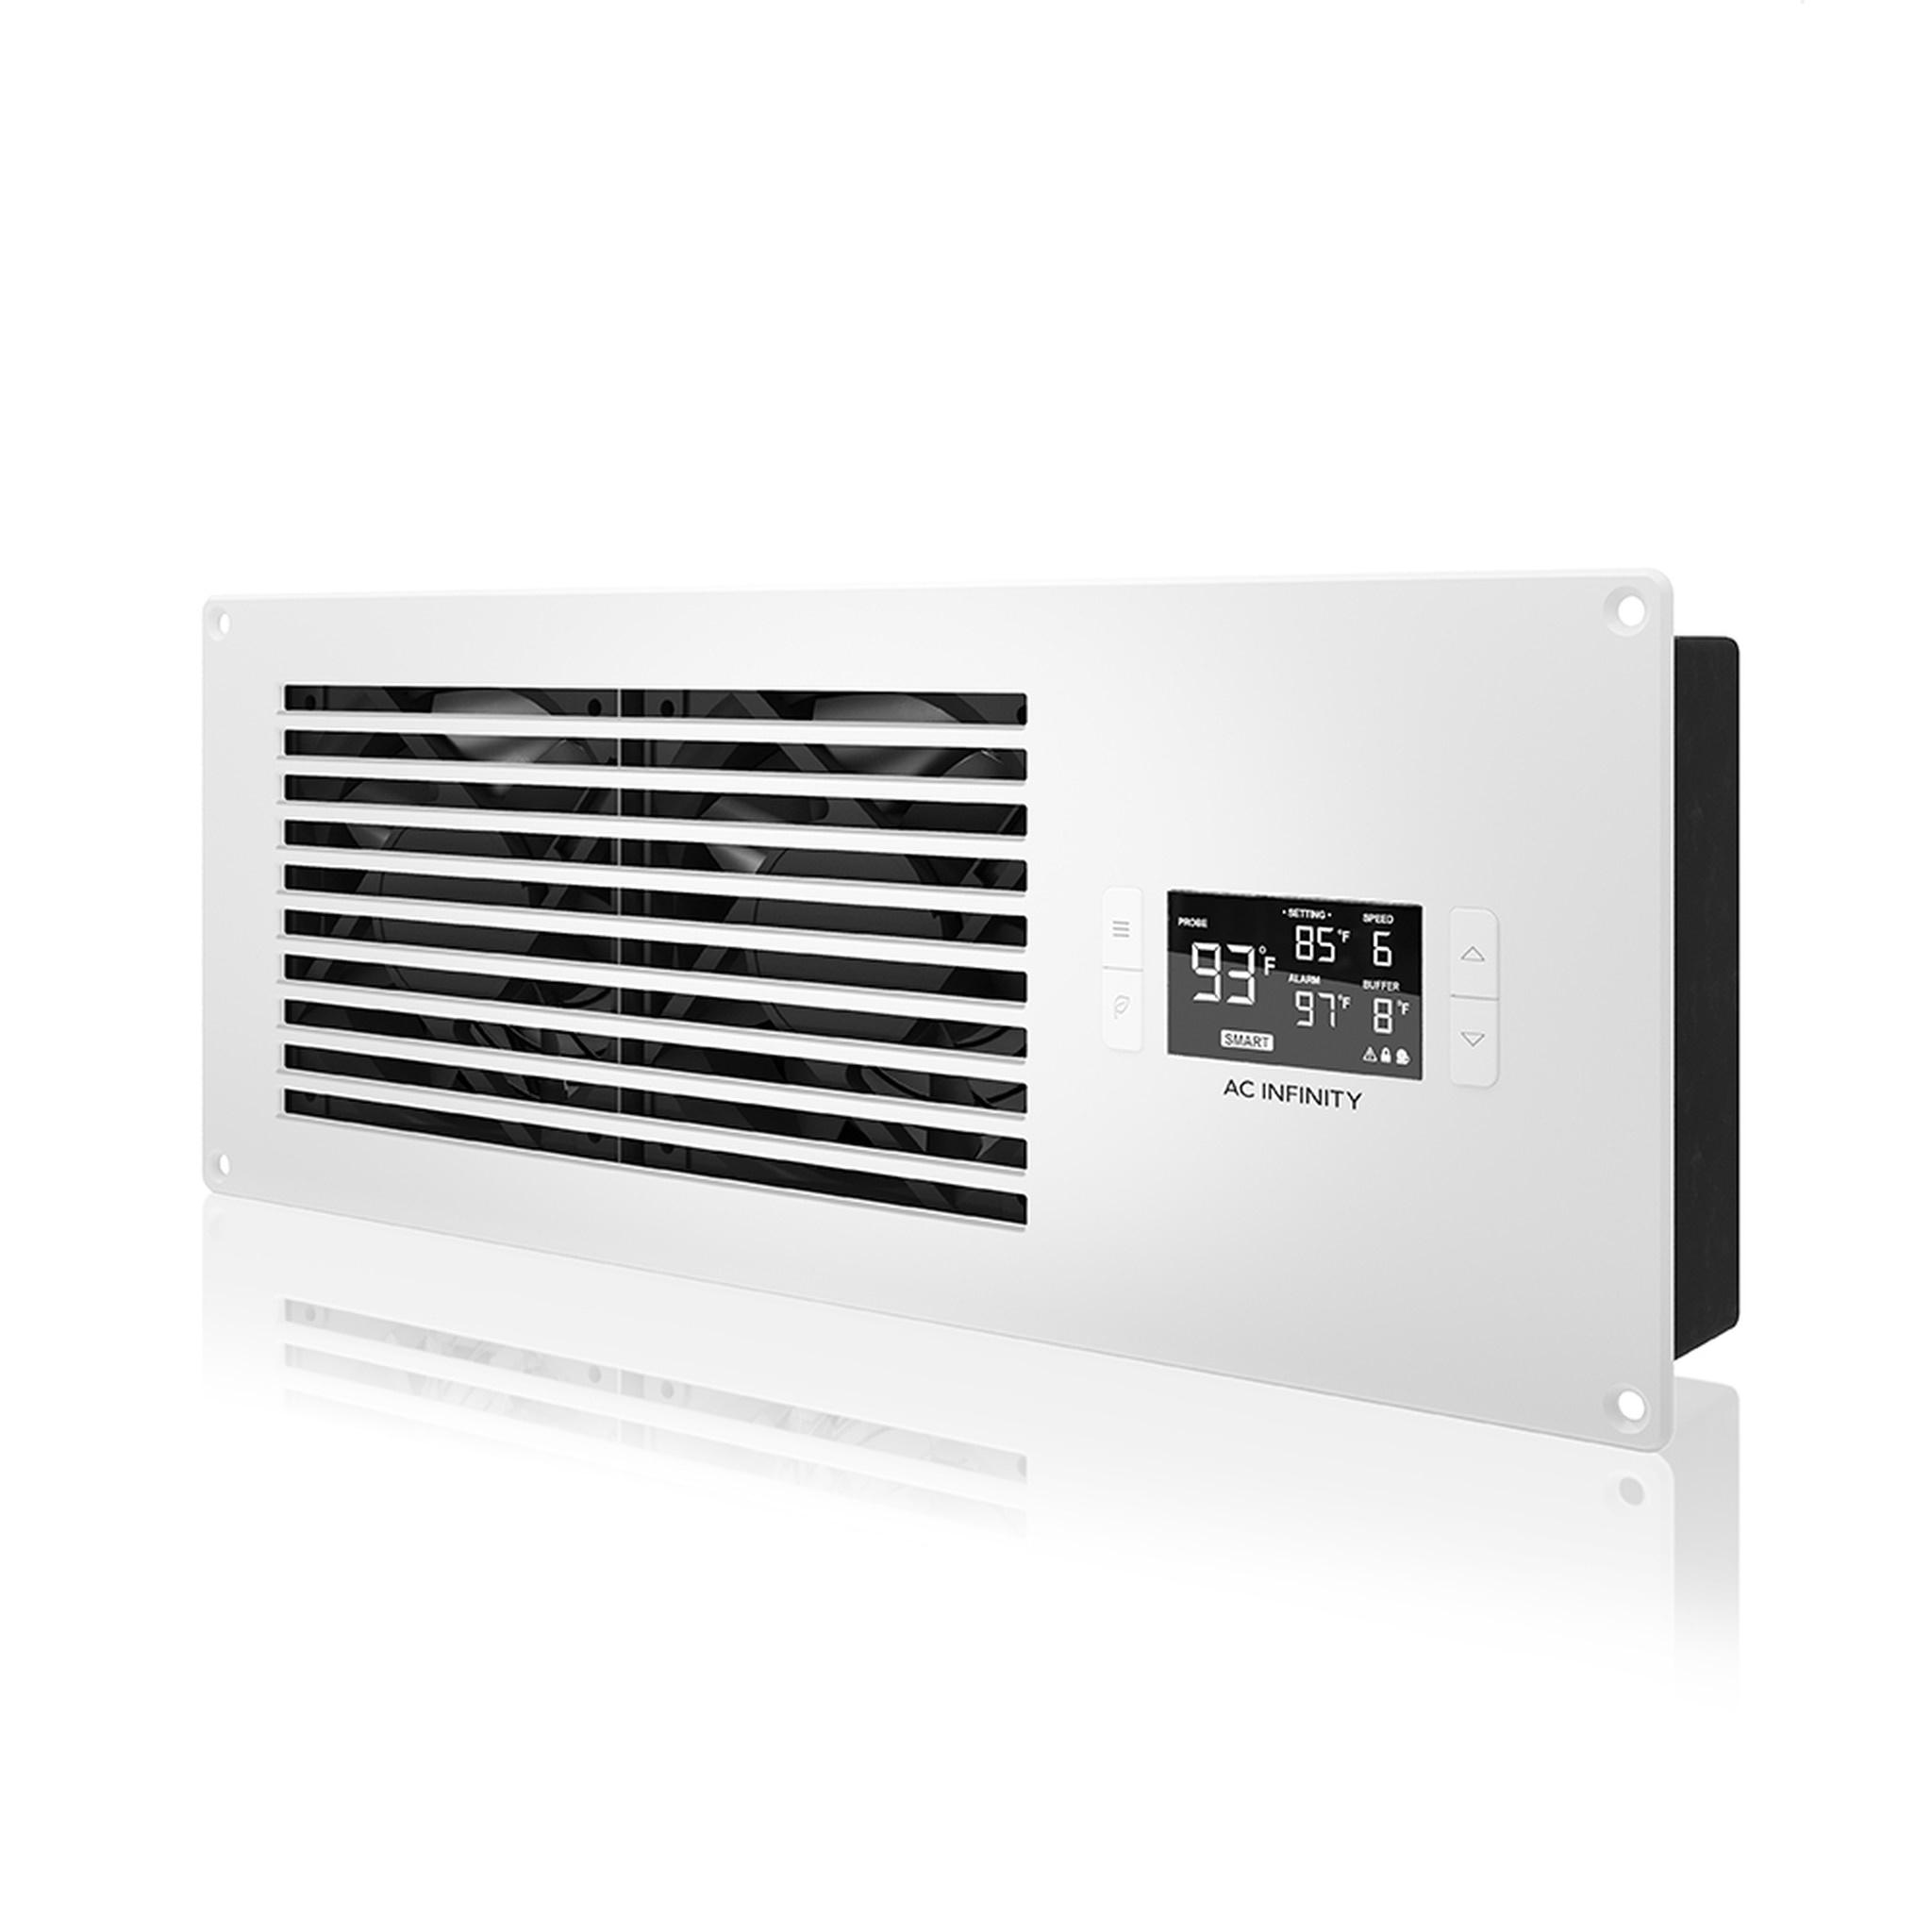 AC Infinity Airframe T7 AV Closet Fan System